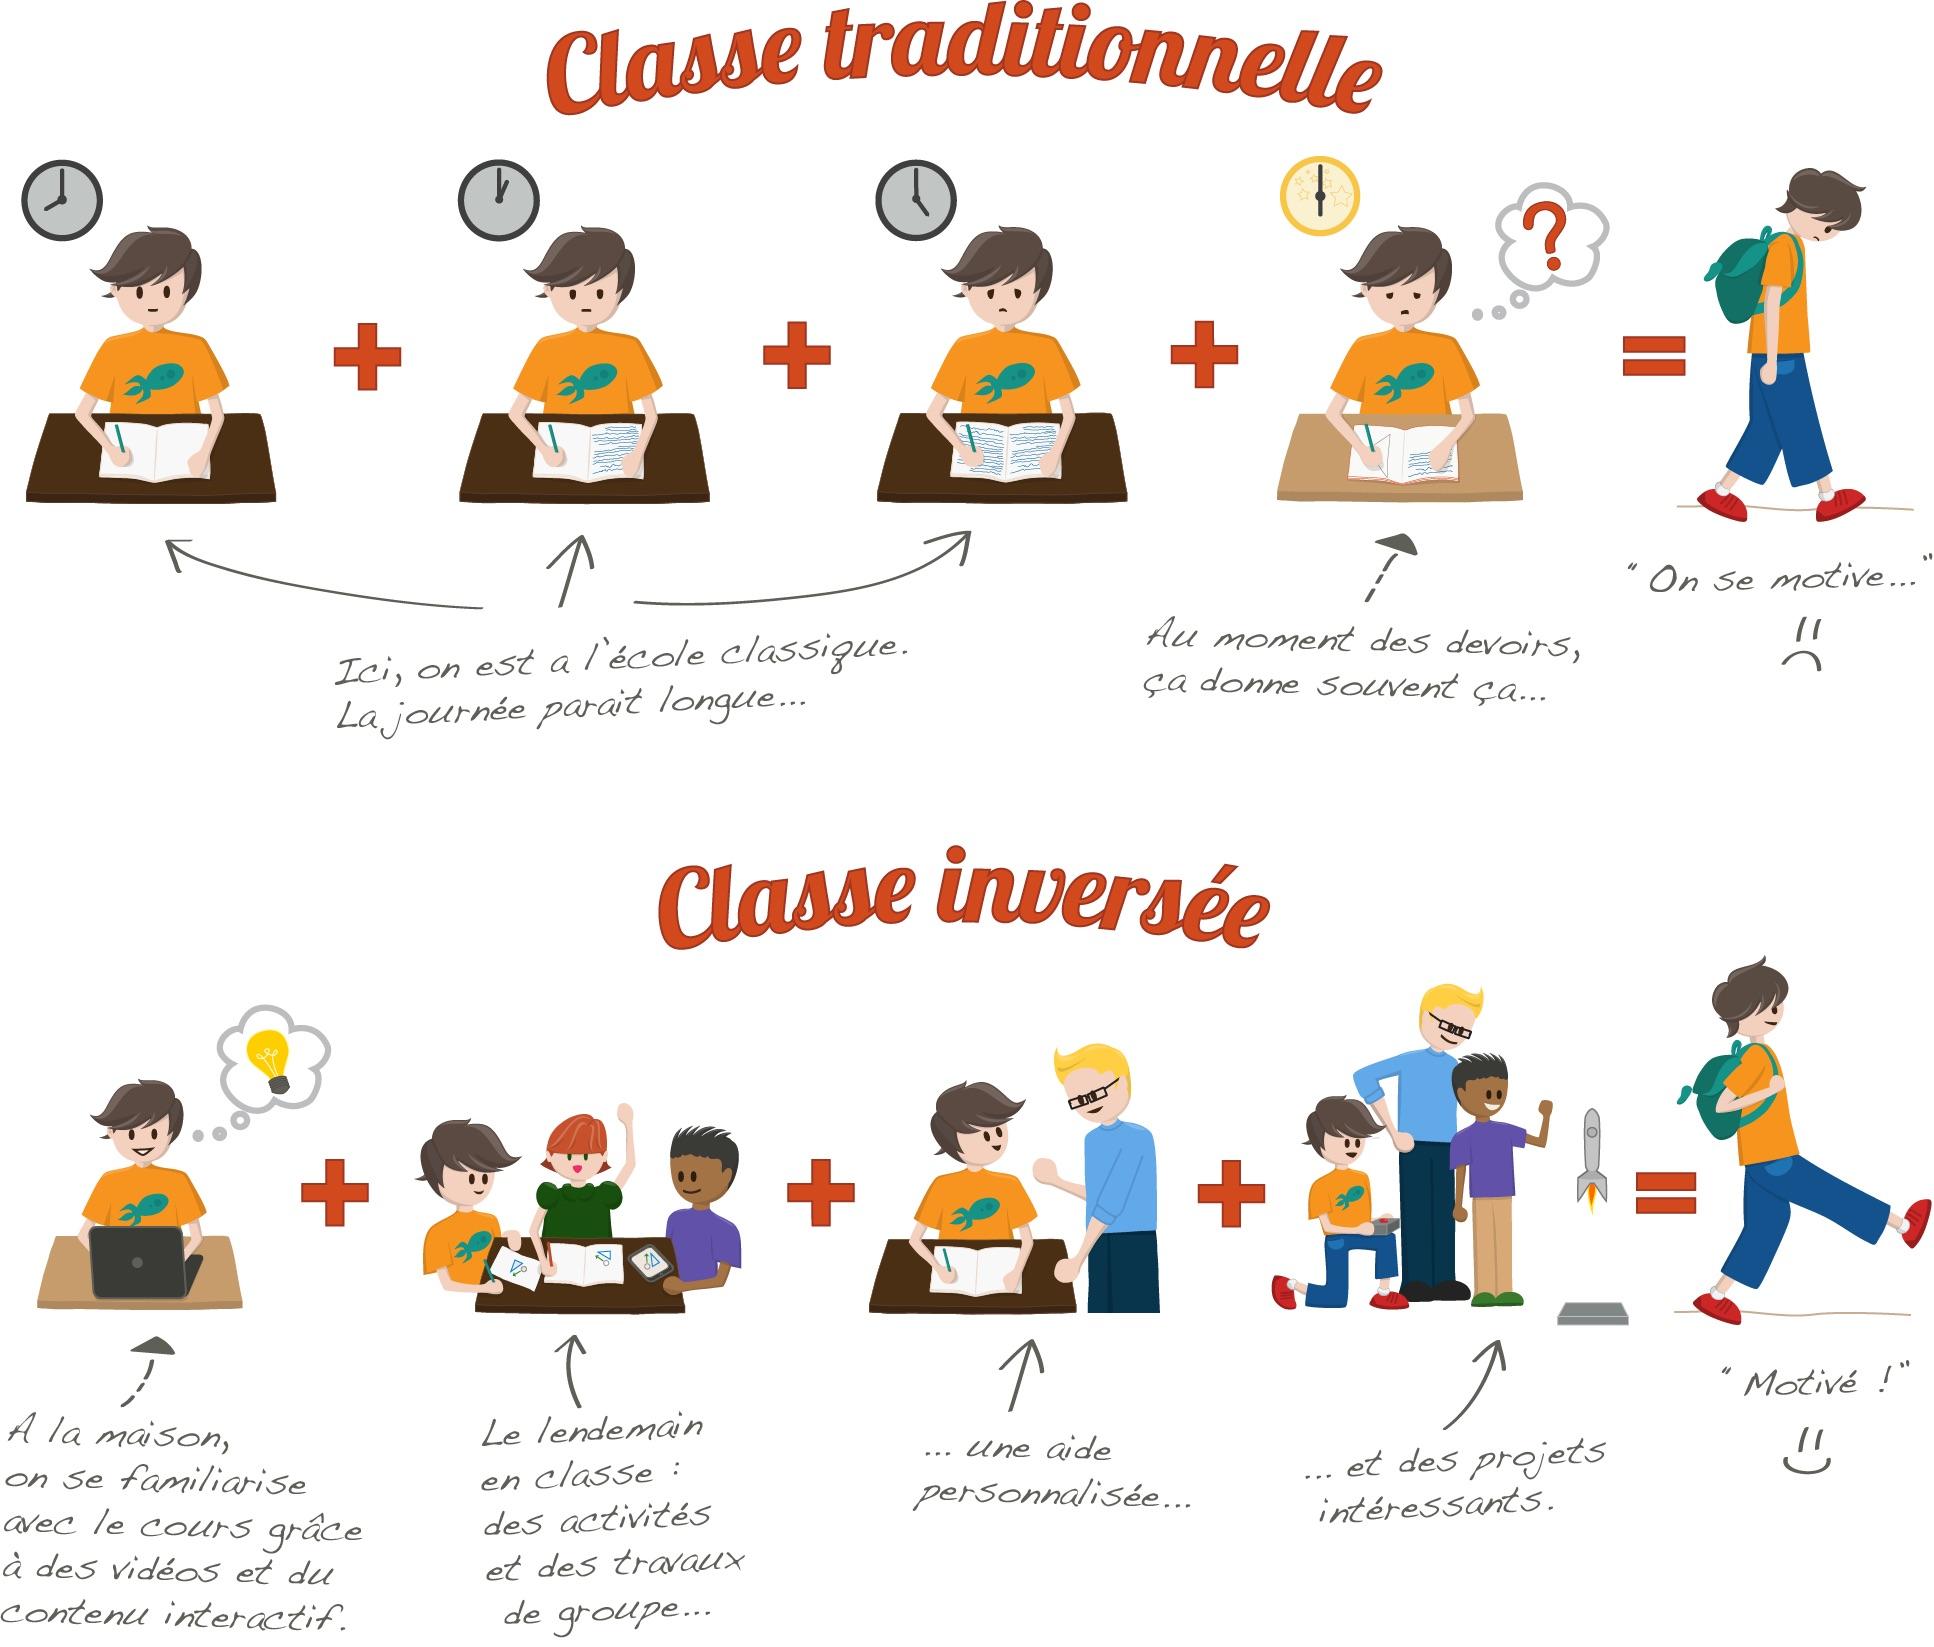 Homework Now Ecole Classique